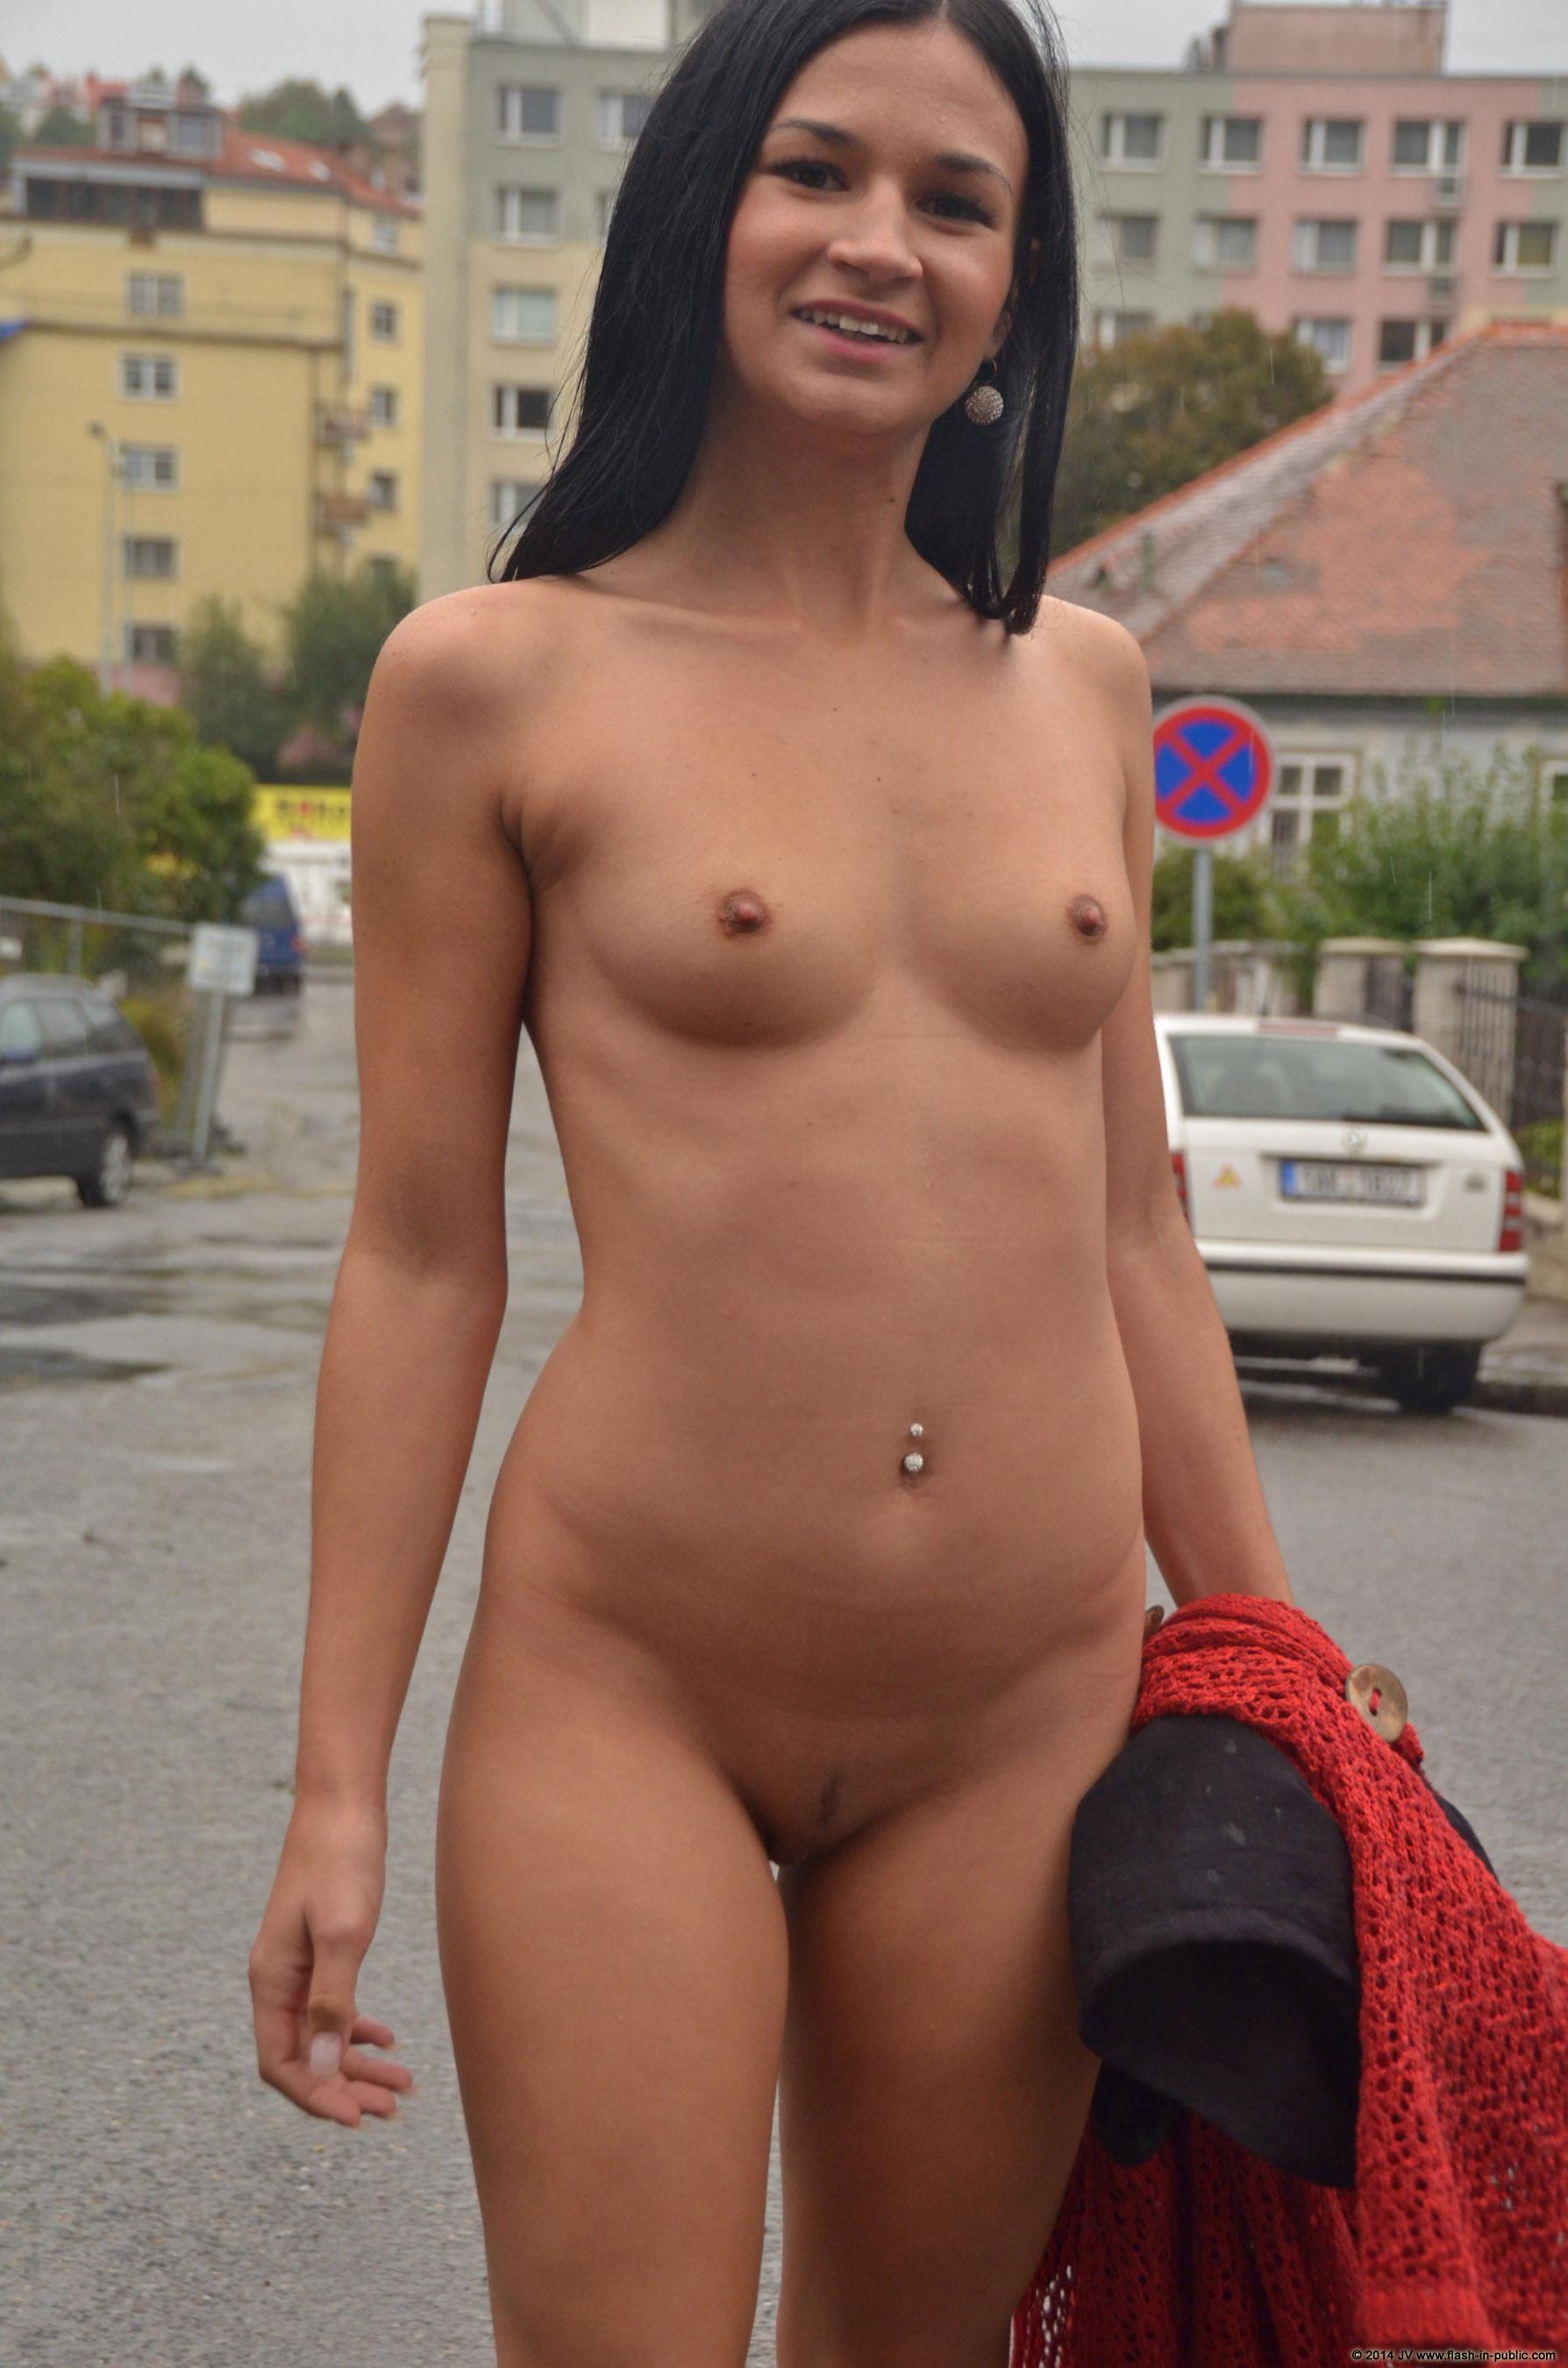 adela-brunette-nude-rain-wet-flash-in-public-25